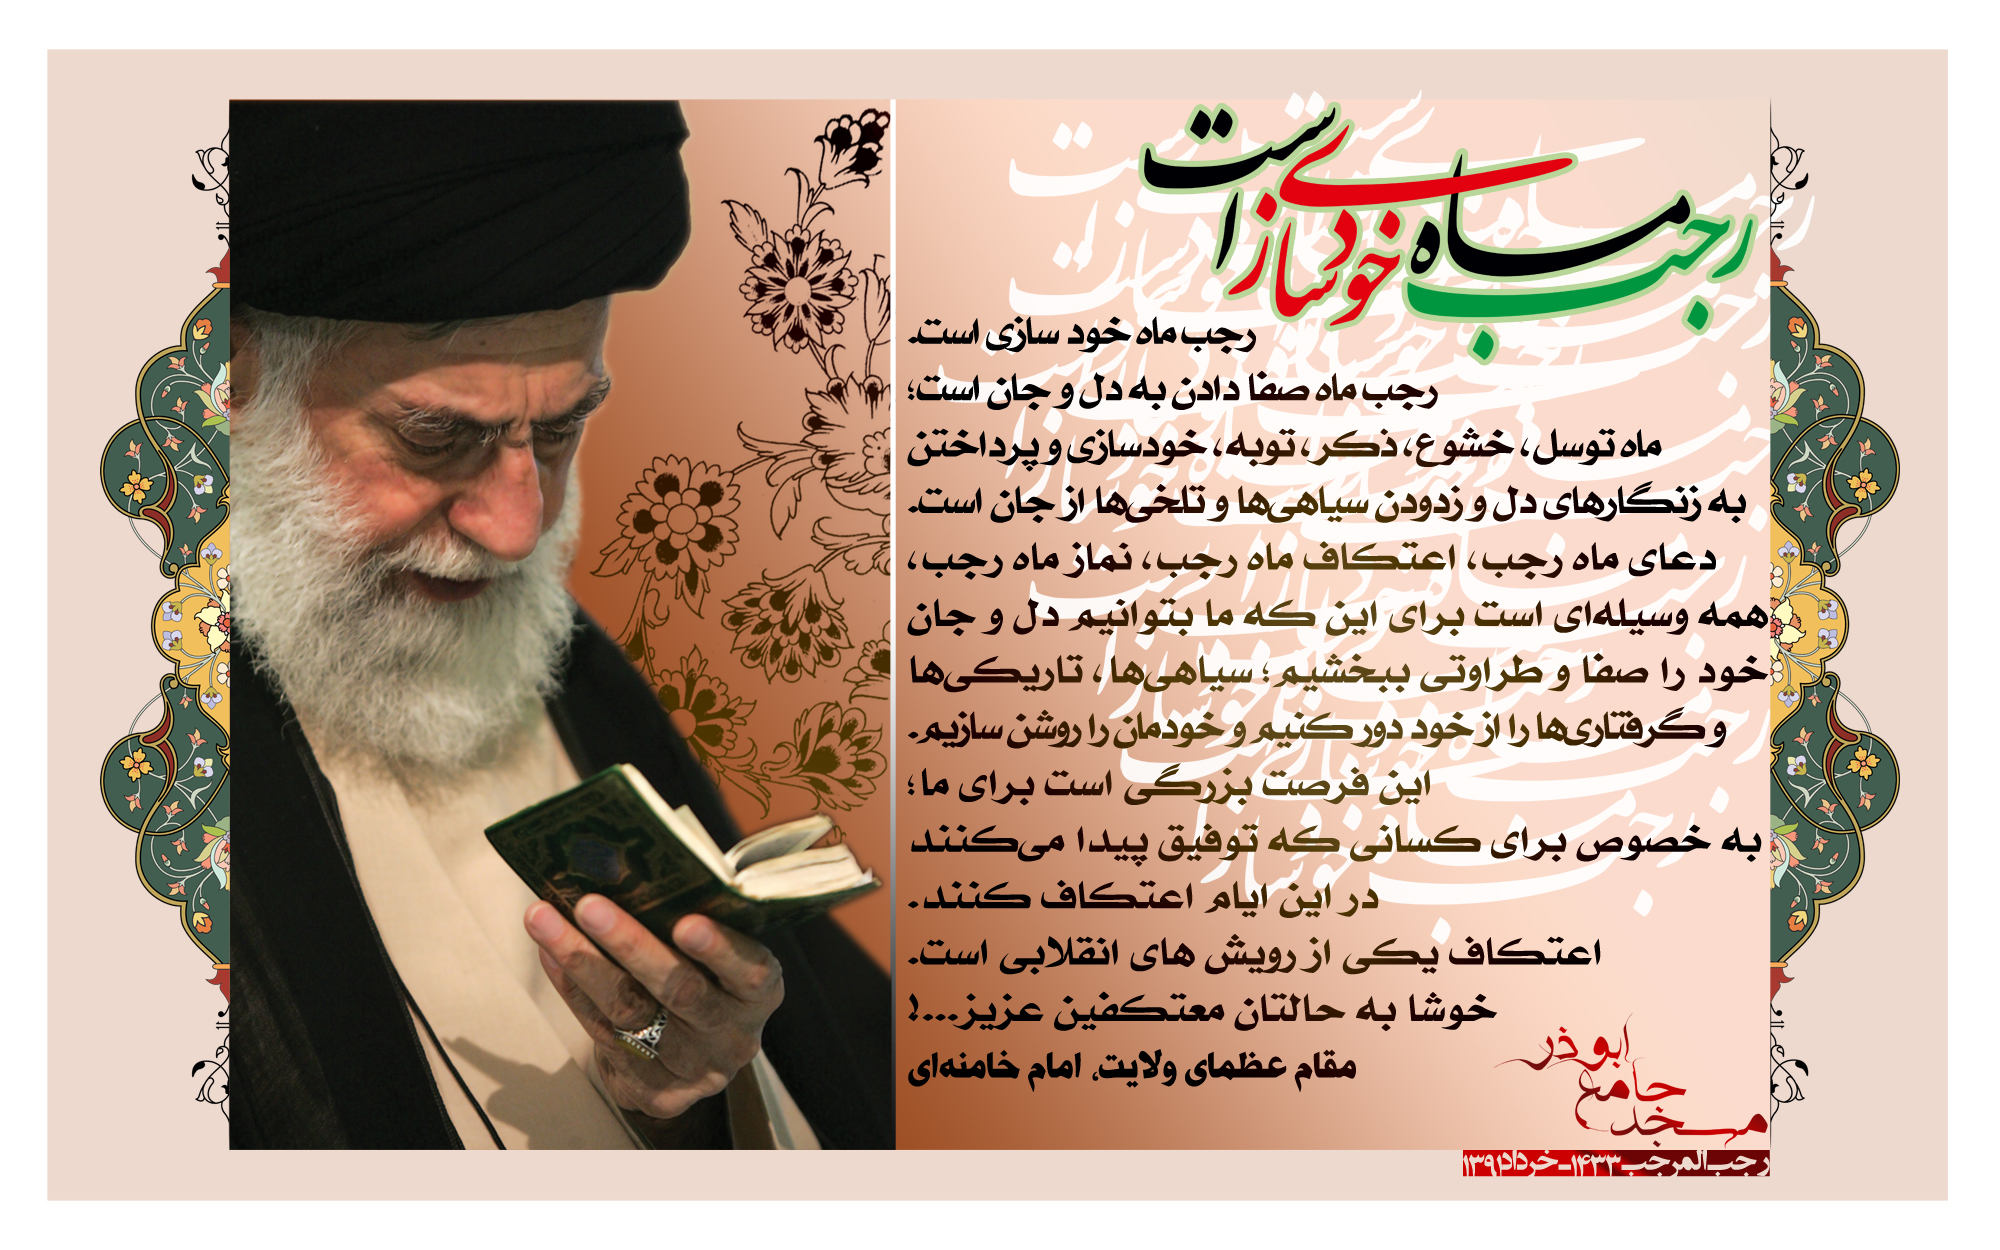 http://bi-neshan.ir/wp-content/uploads/2012/05/Masjed-Abouzar.jpg